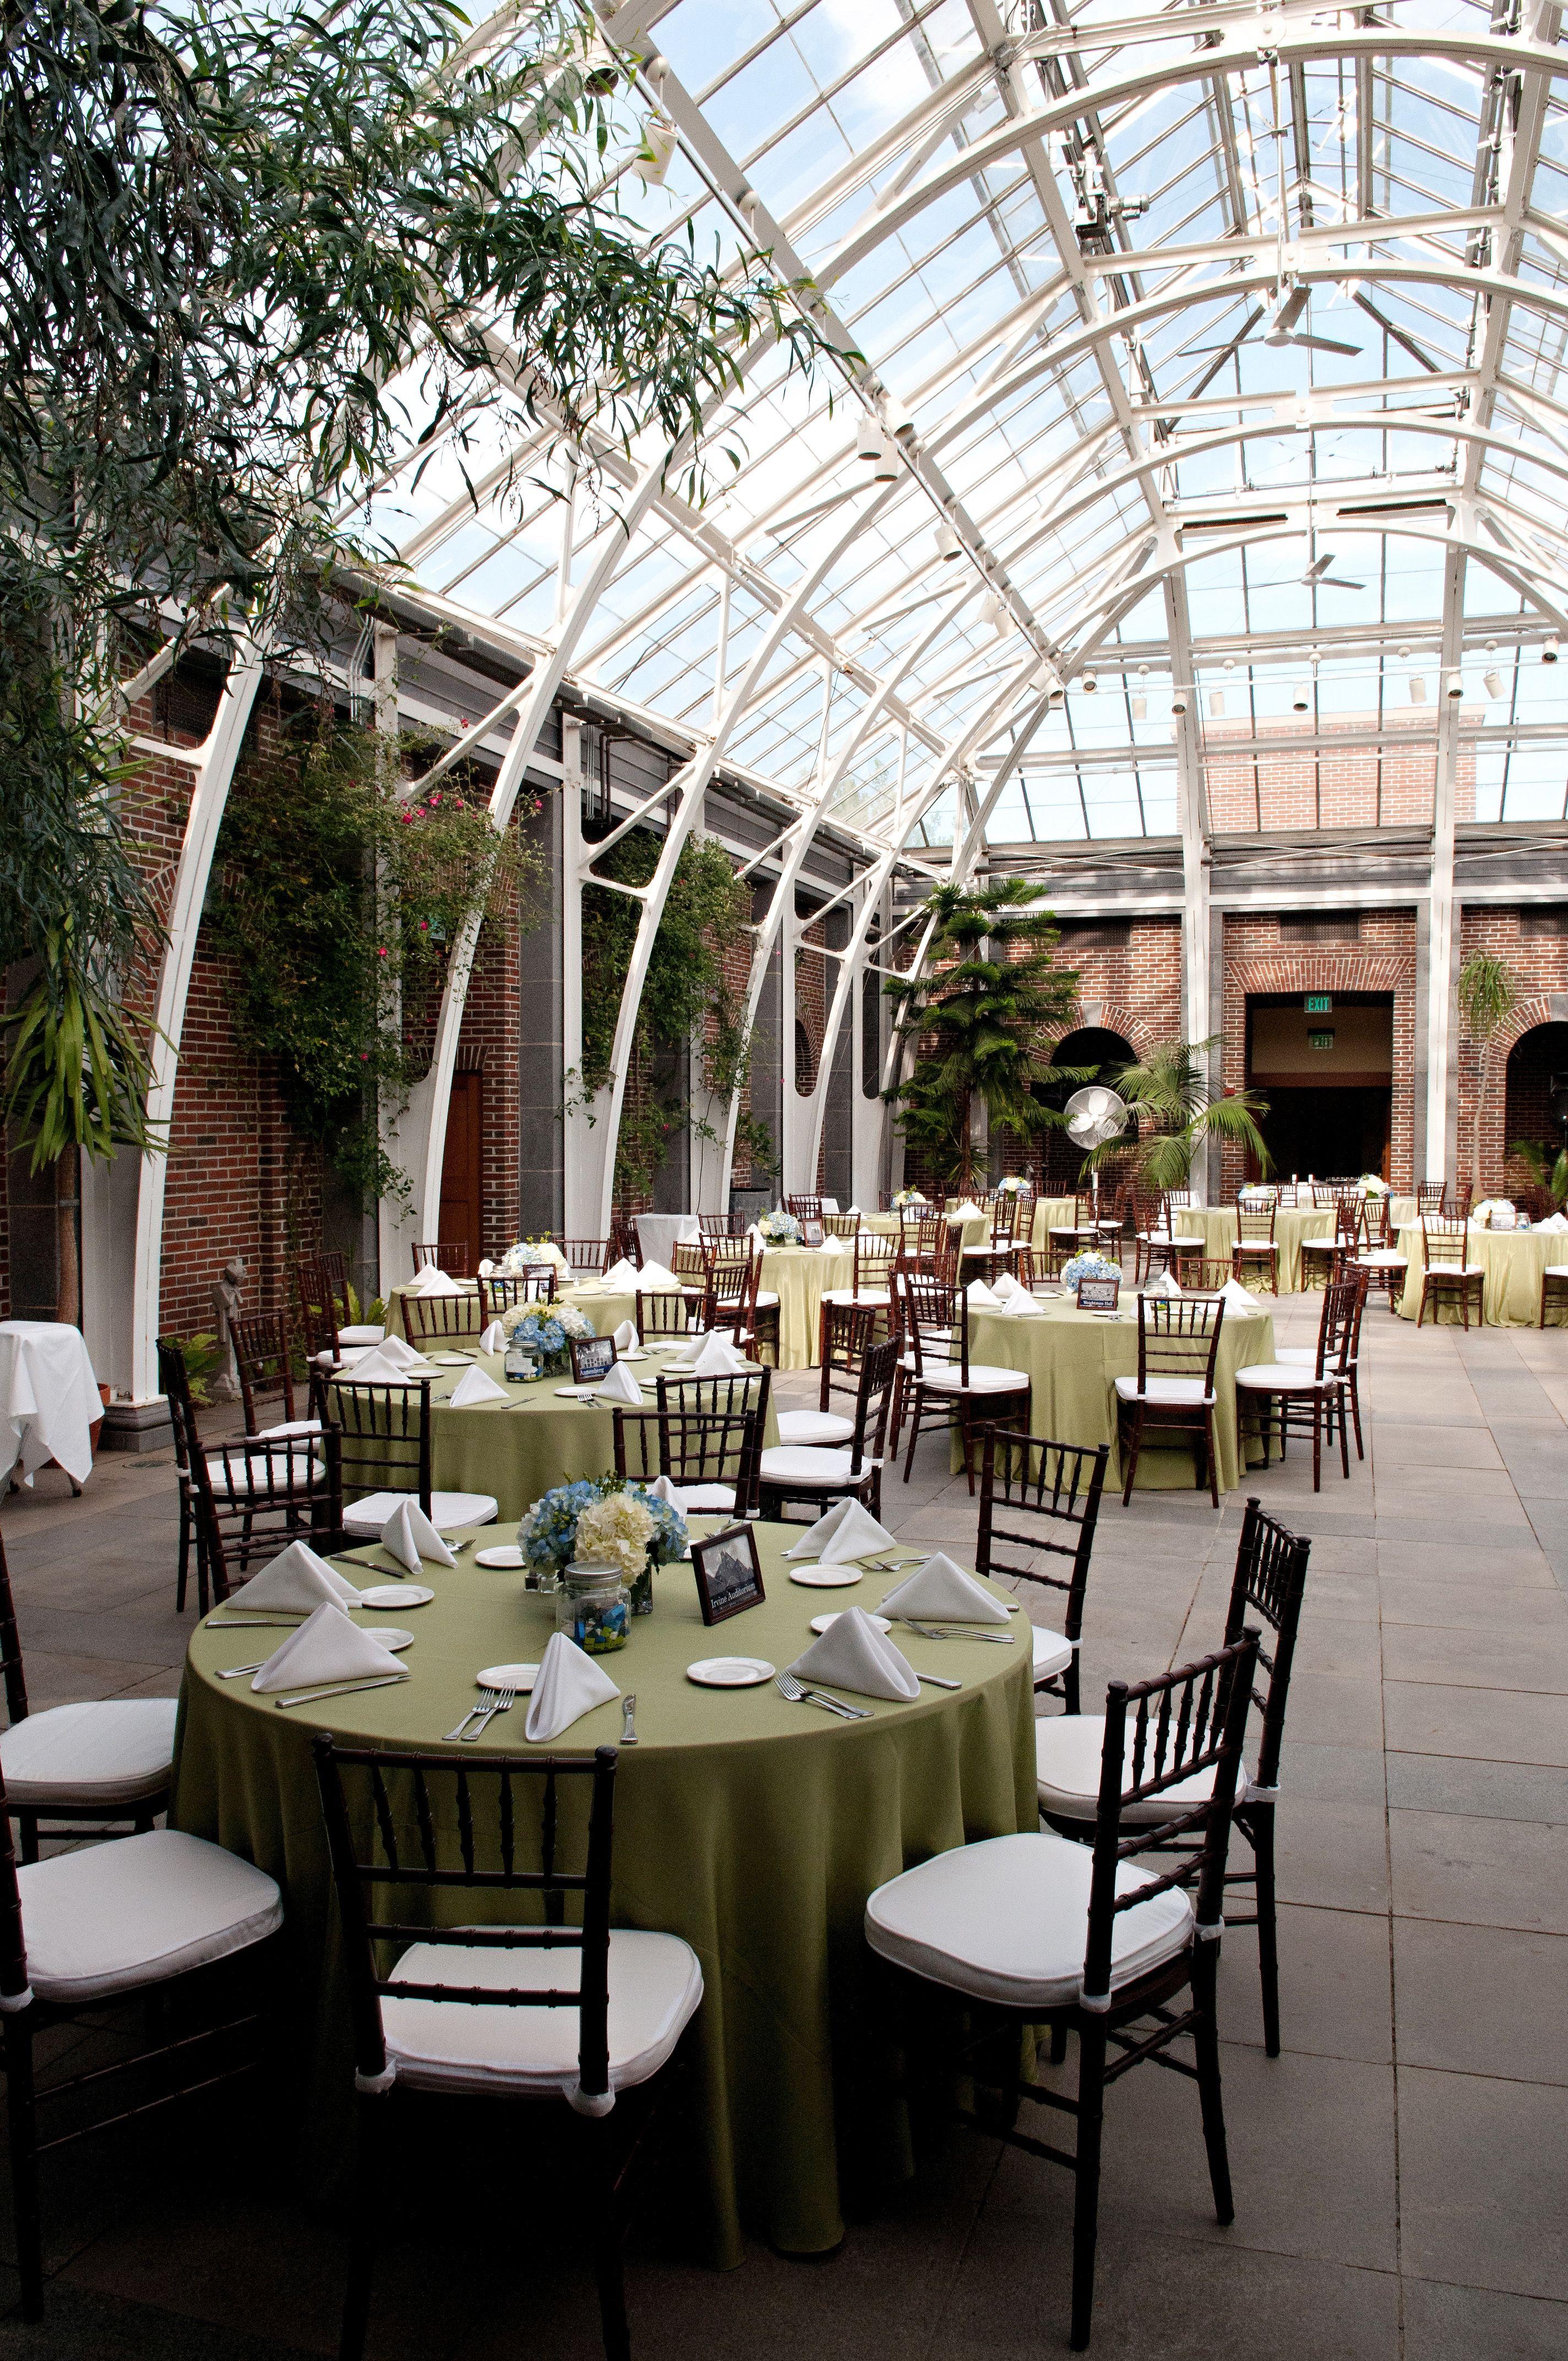 Tower Hill Botanical Garden In Boylston Ma Wedding Reception Centerpiece And Table Design